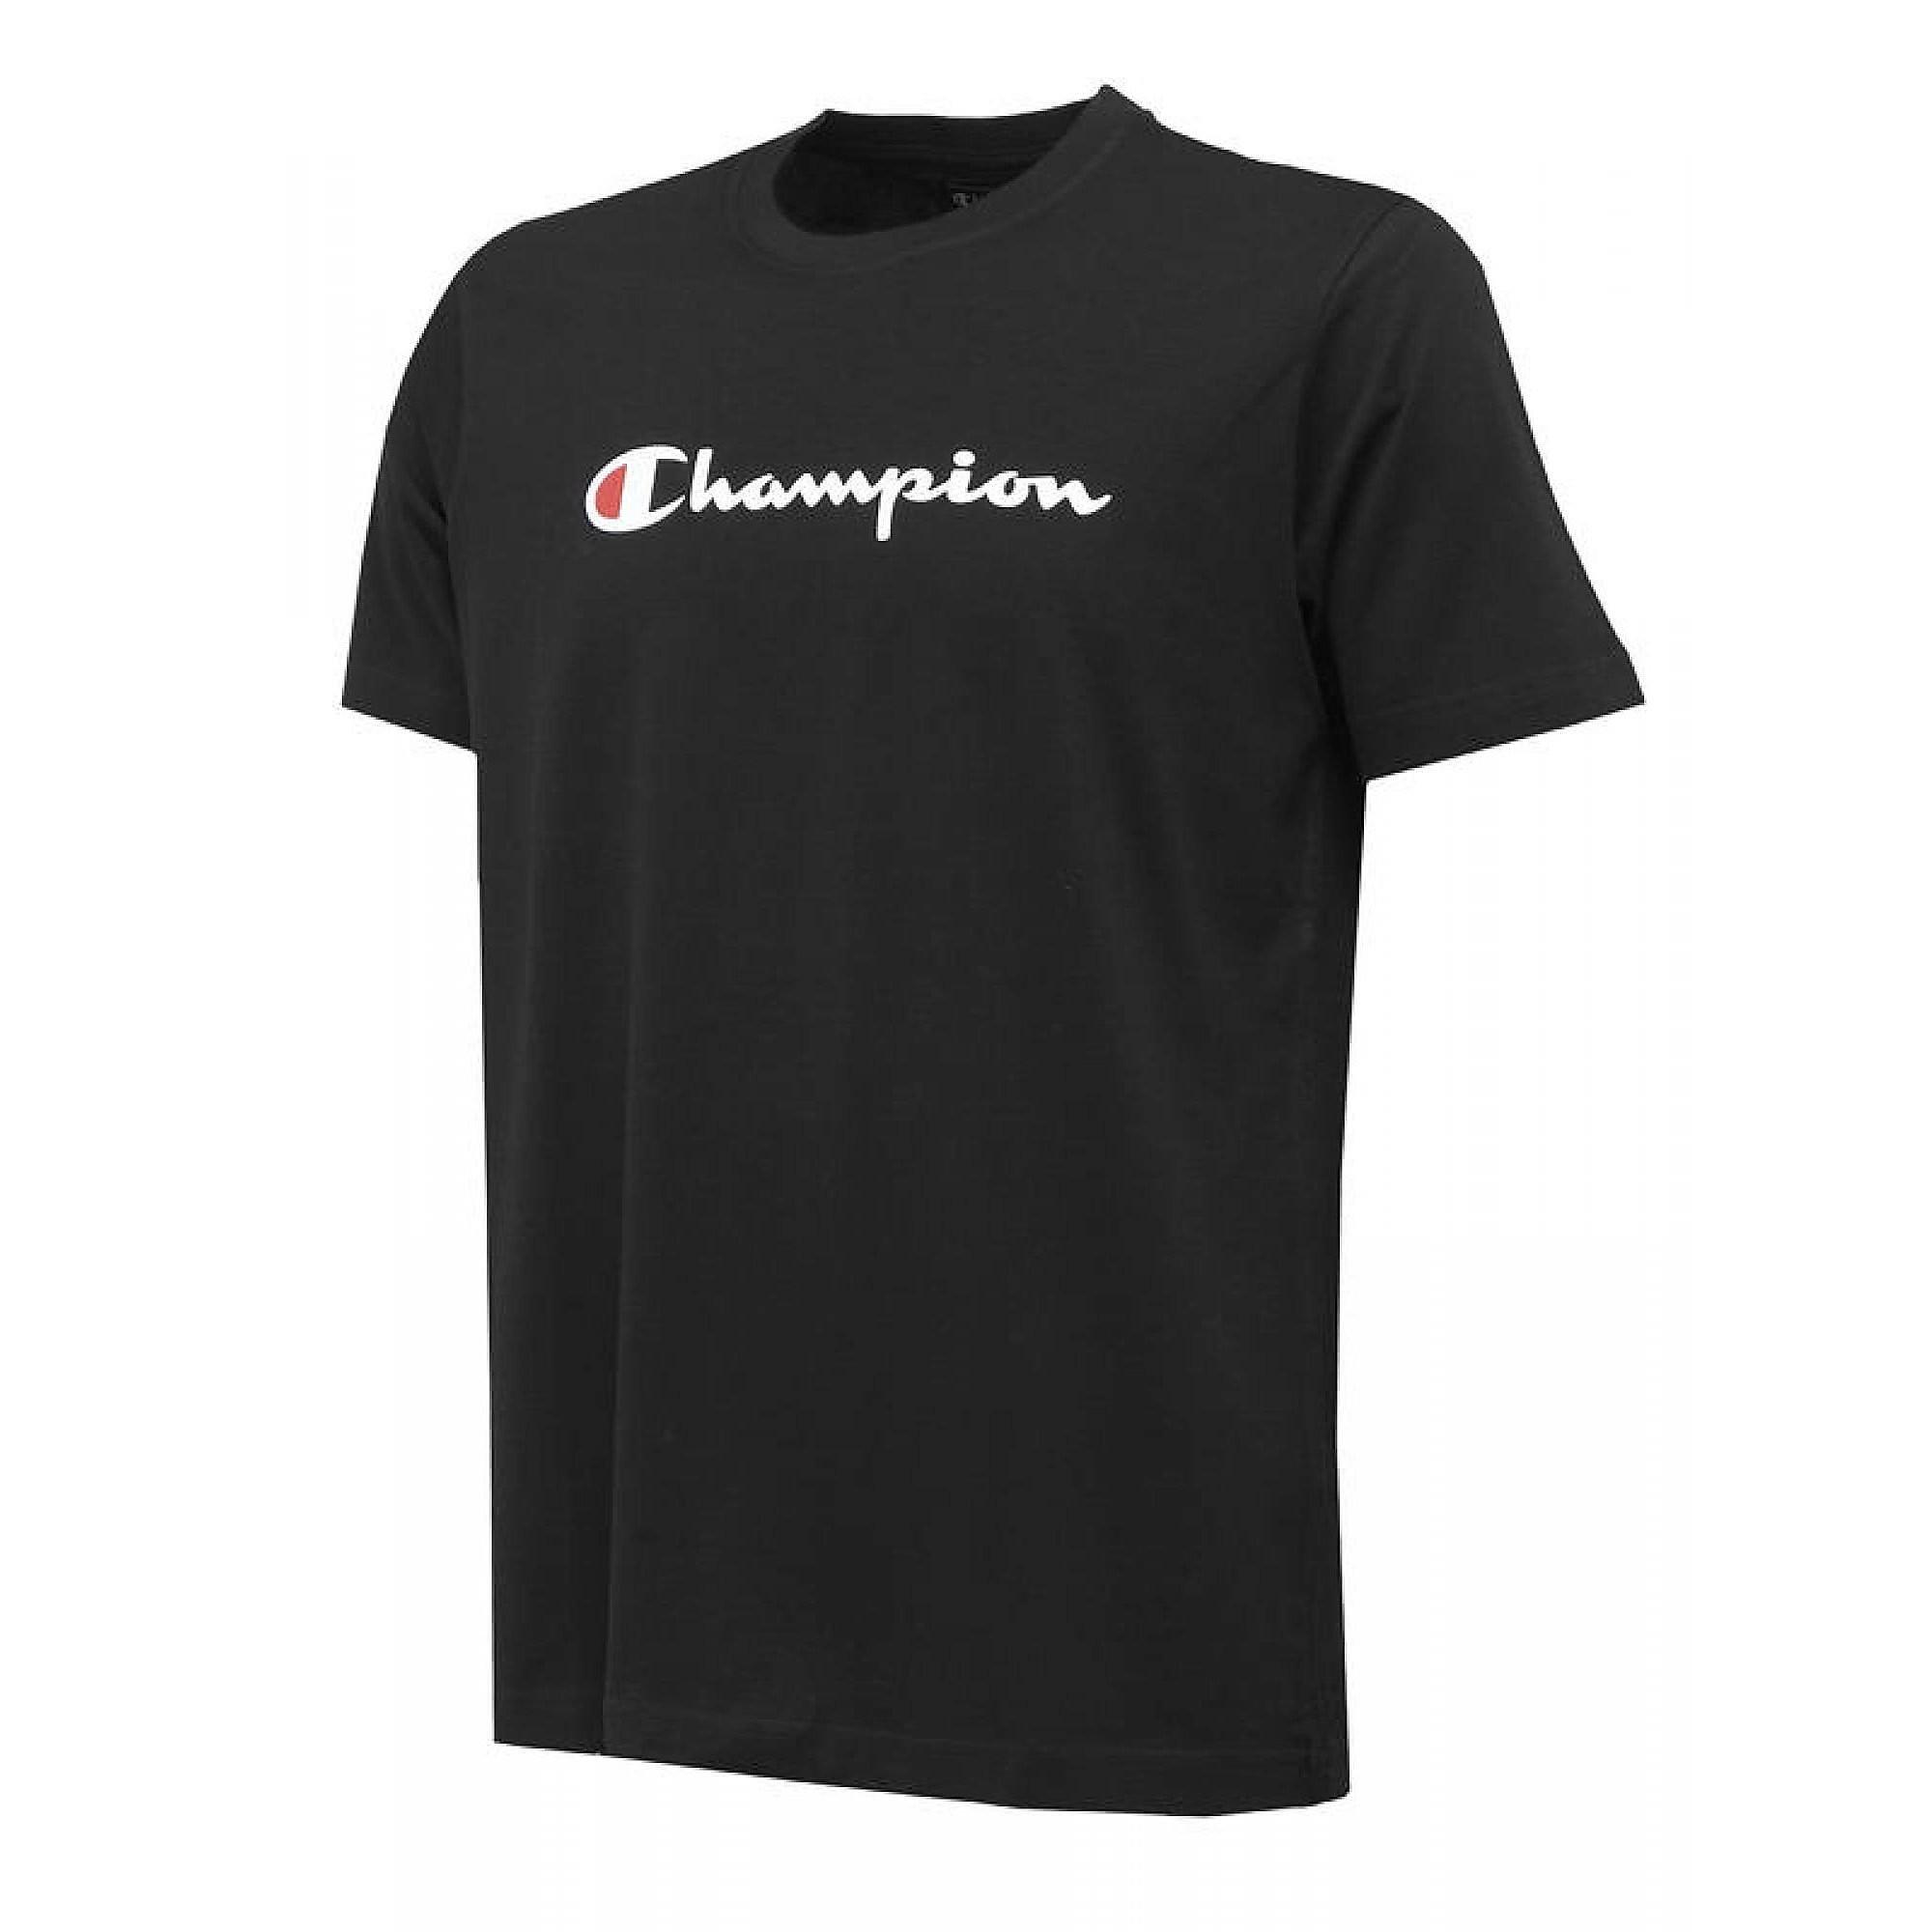 Champion BARID T-shirt